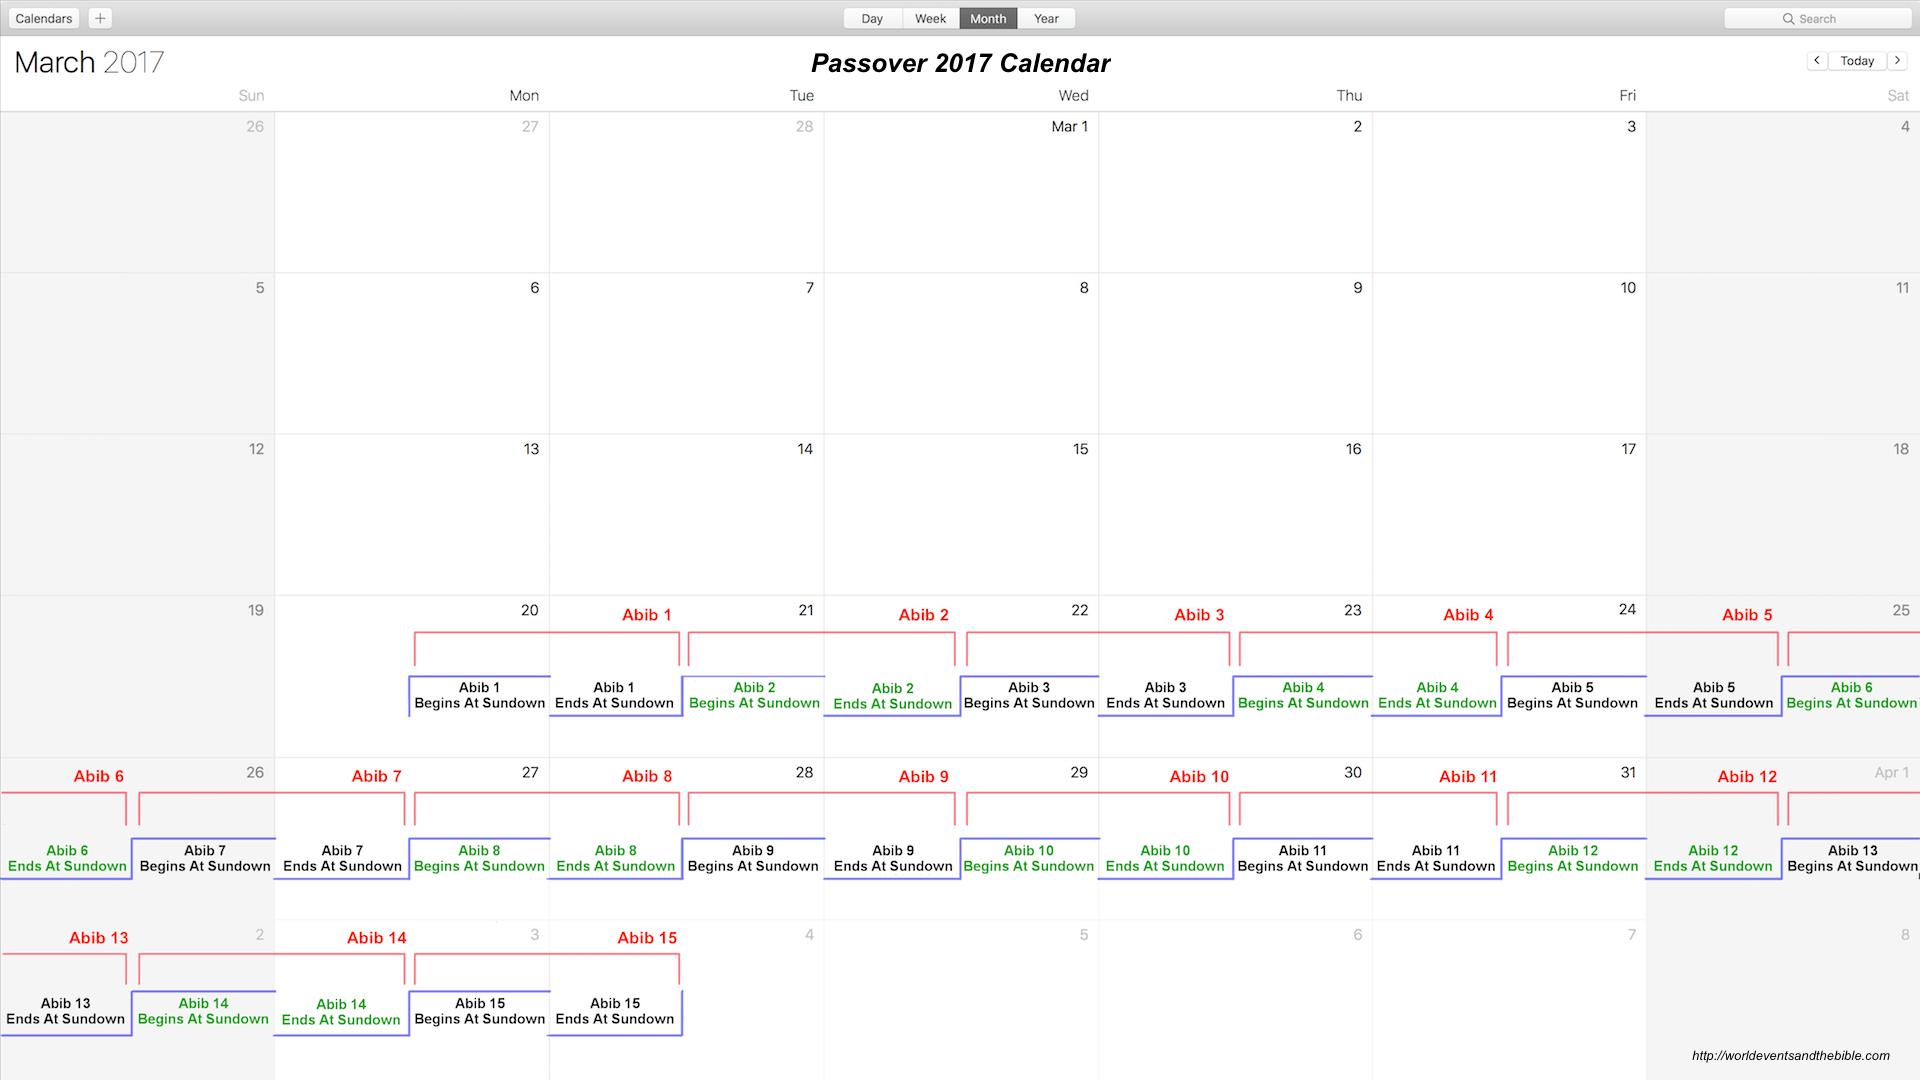 Passover 2017 Calendar